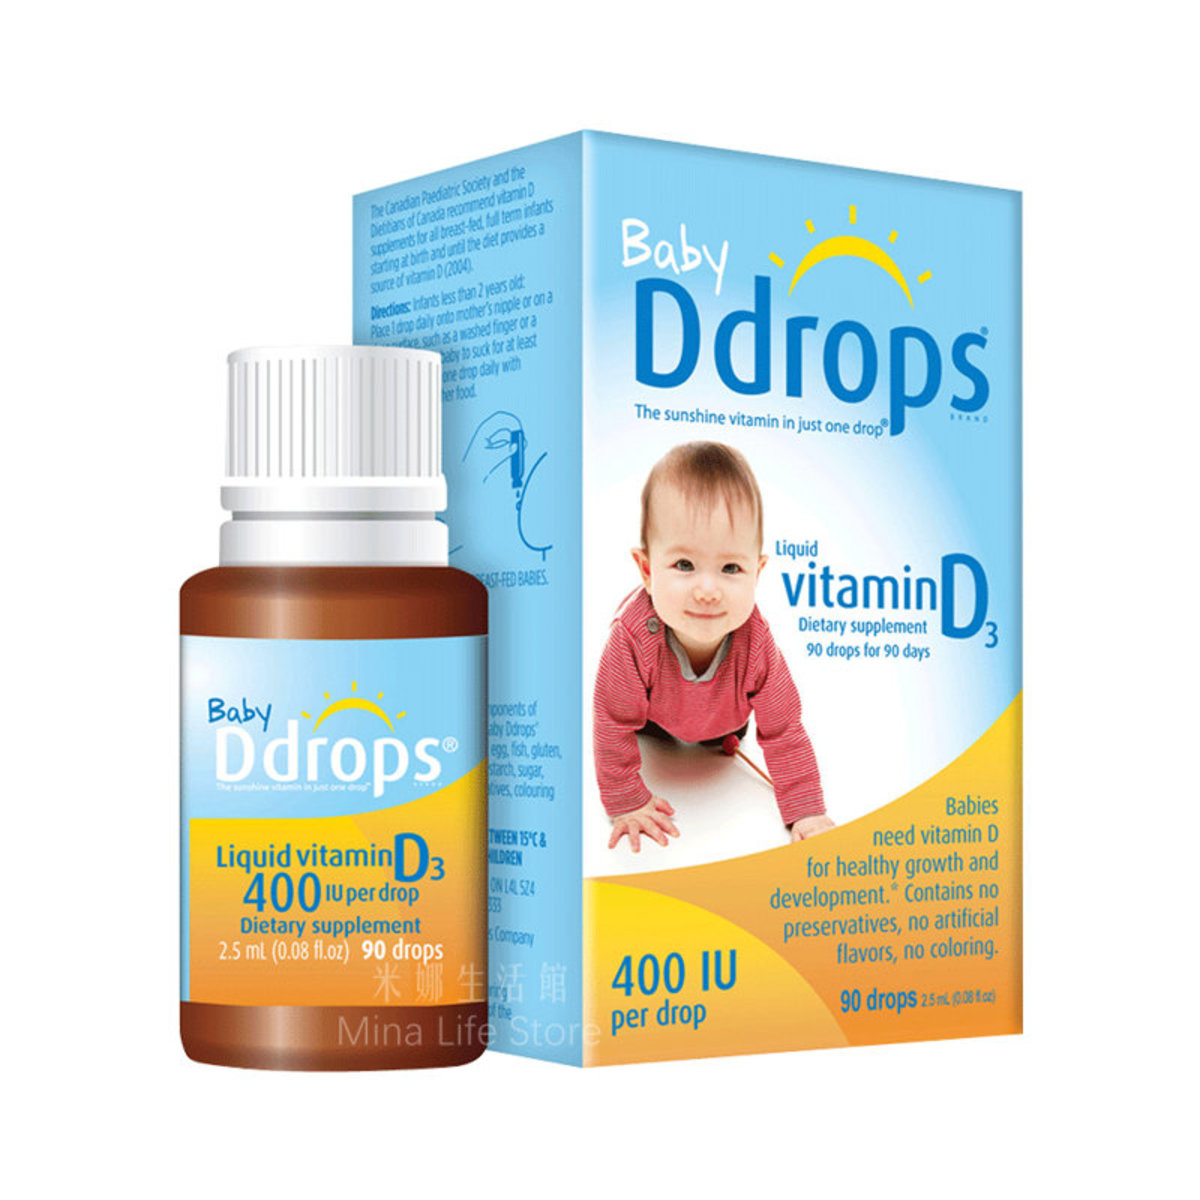 Baby Ddrops Vitamin D3, 90 Drops (2.5ml)